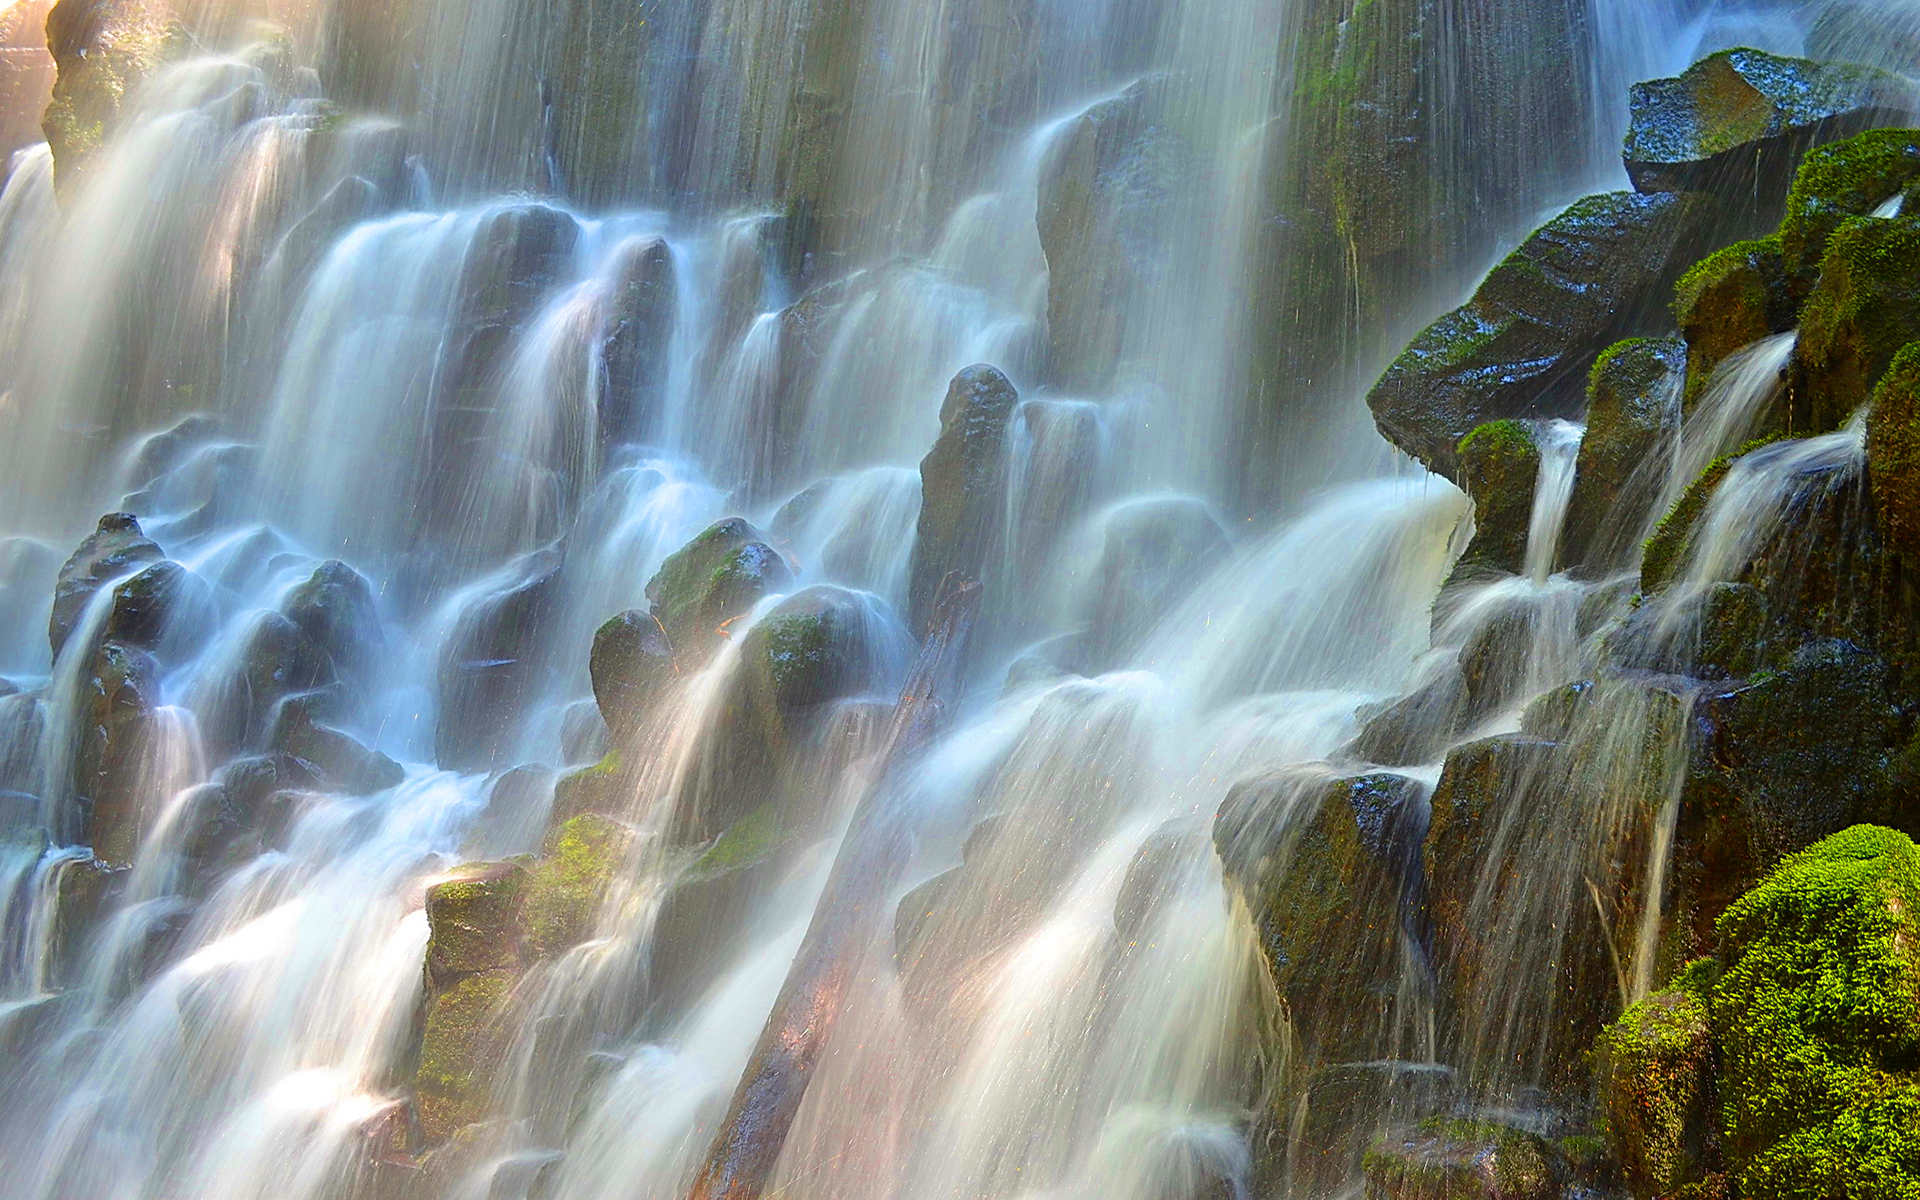 Free Download Wallpaper 3d Windows 7 Waterfall Images Usa Hd Desktop Wallpapers 4k Hd